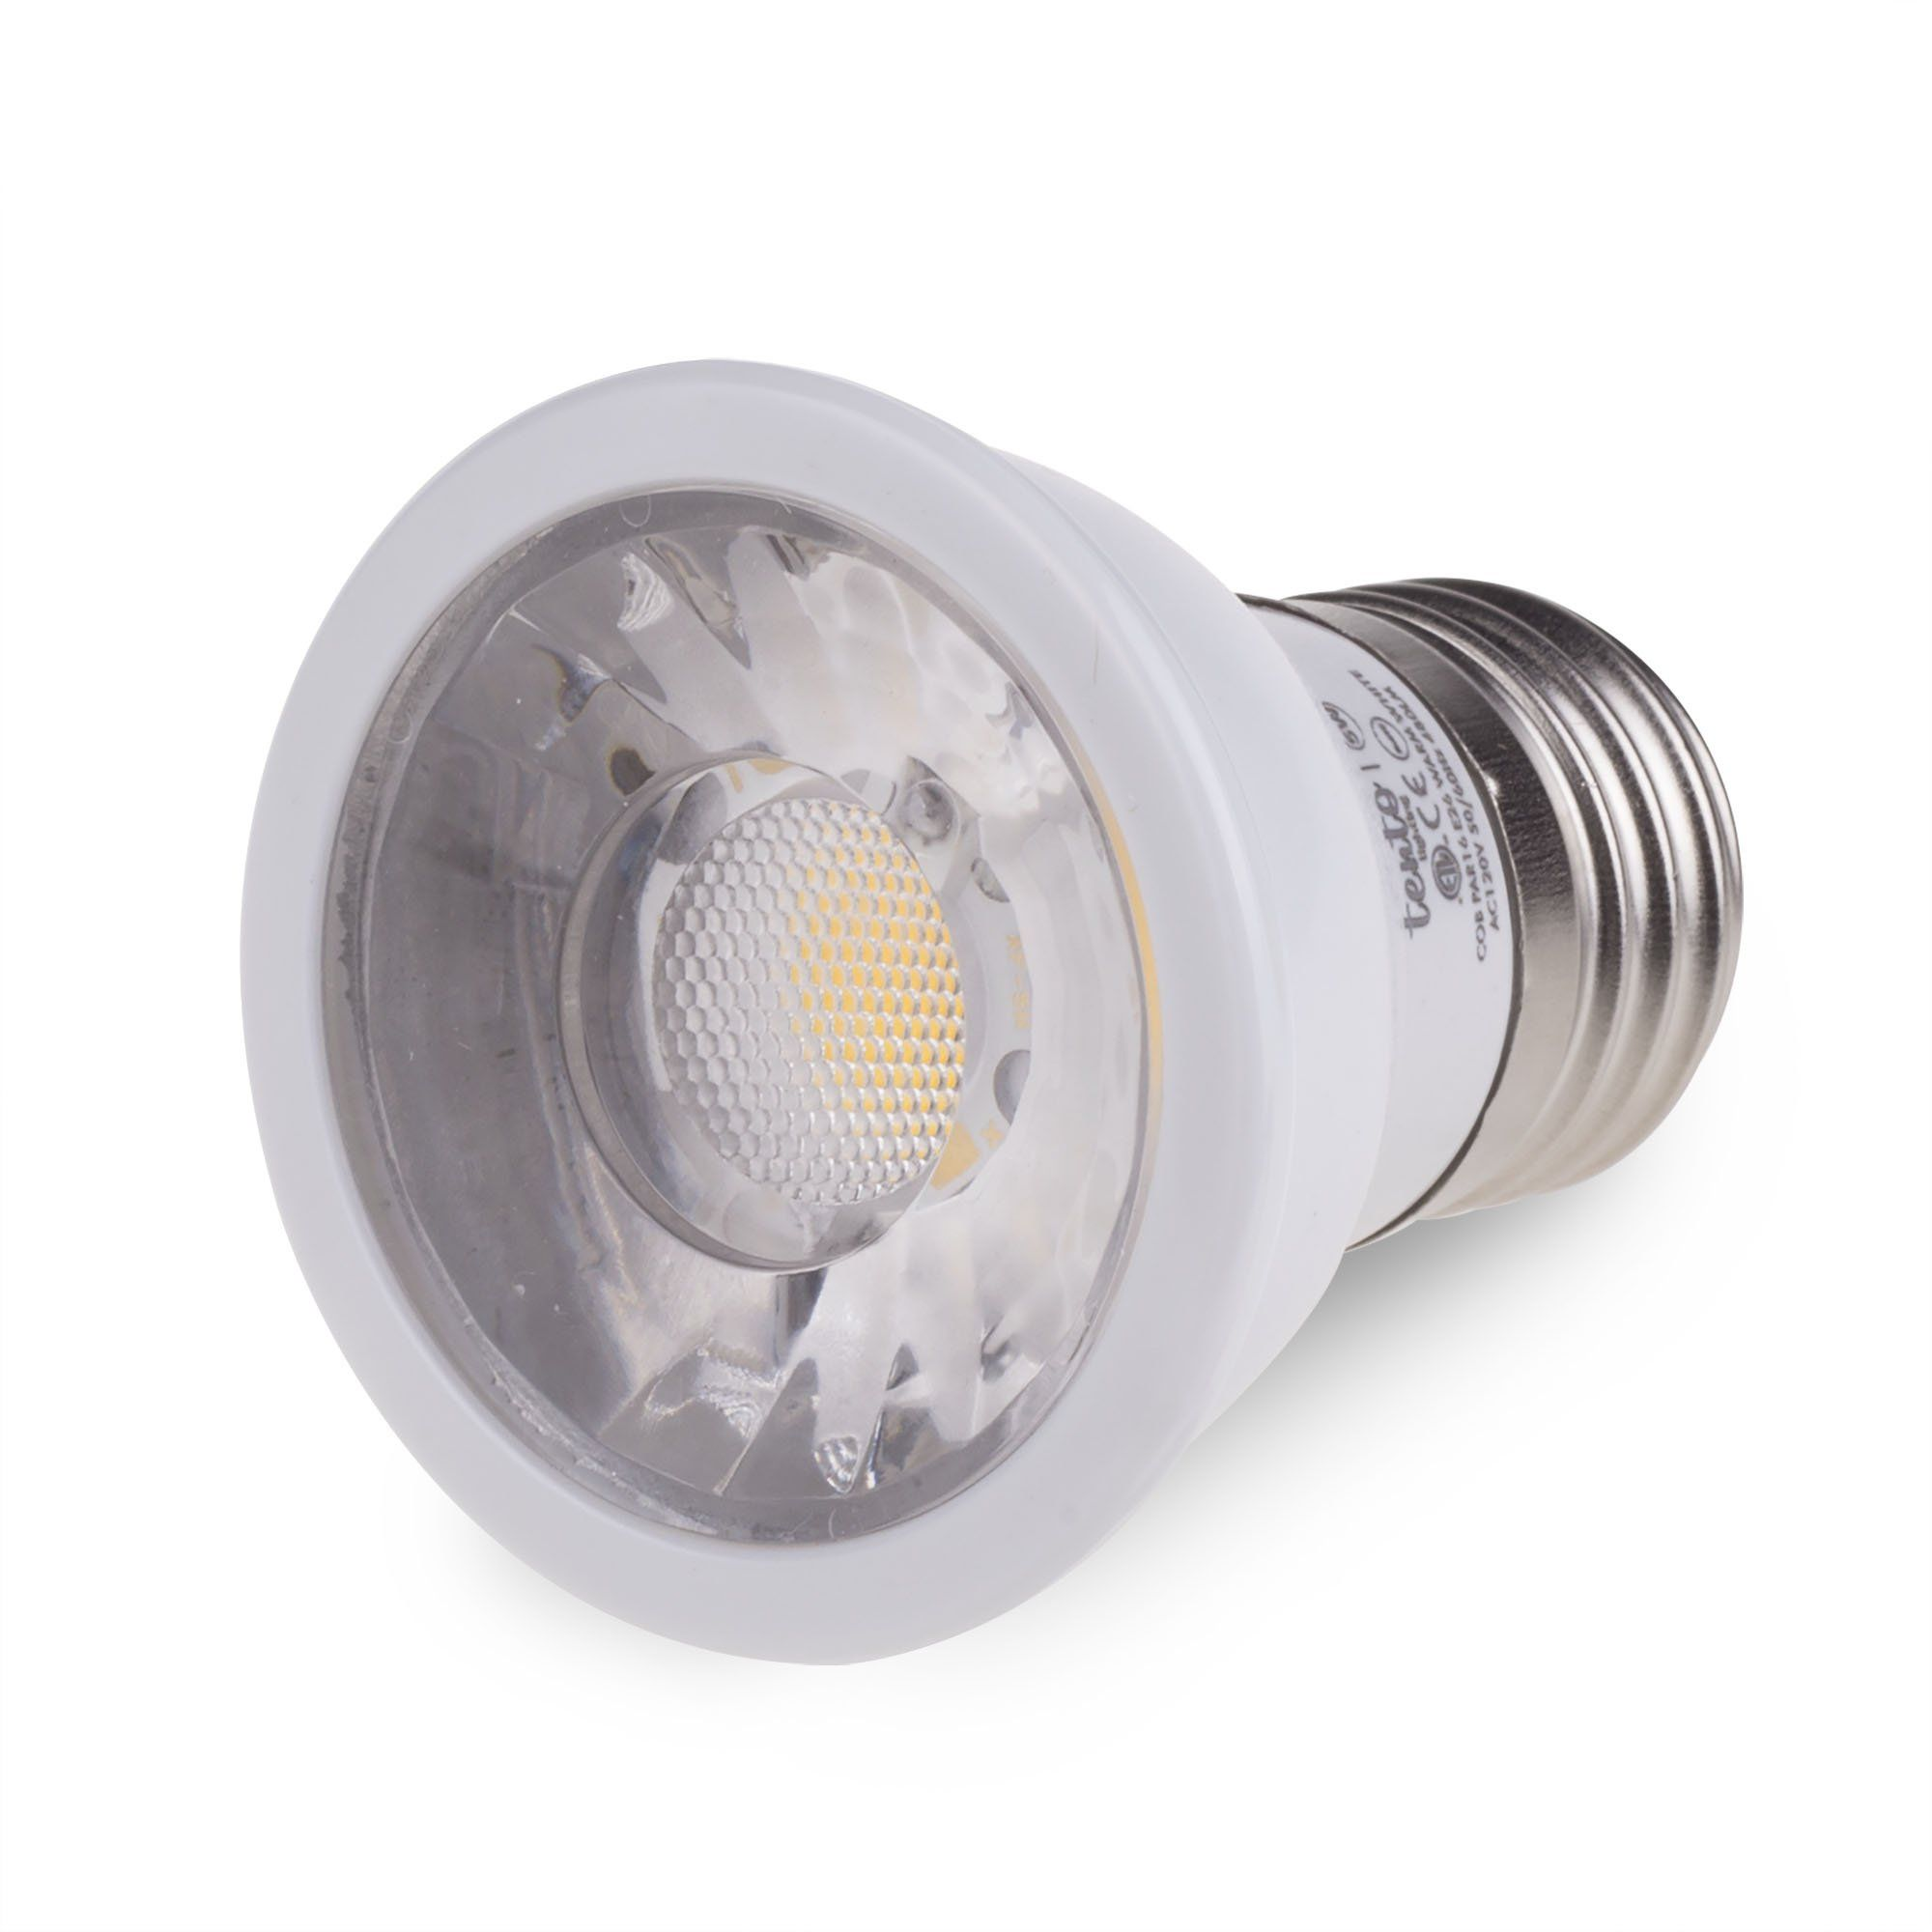 Dimmable Led Par16 Light Bulbs Daylight White Color 5000k 10